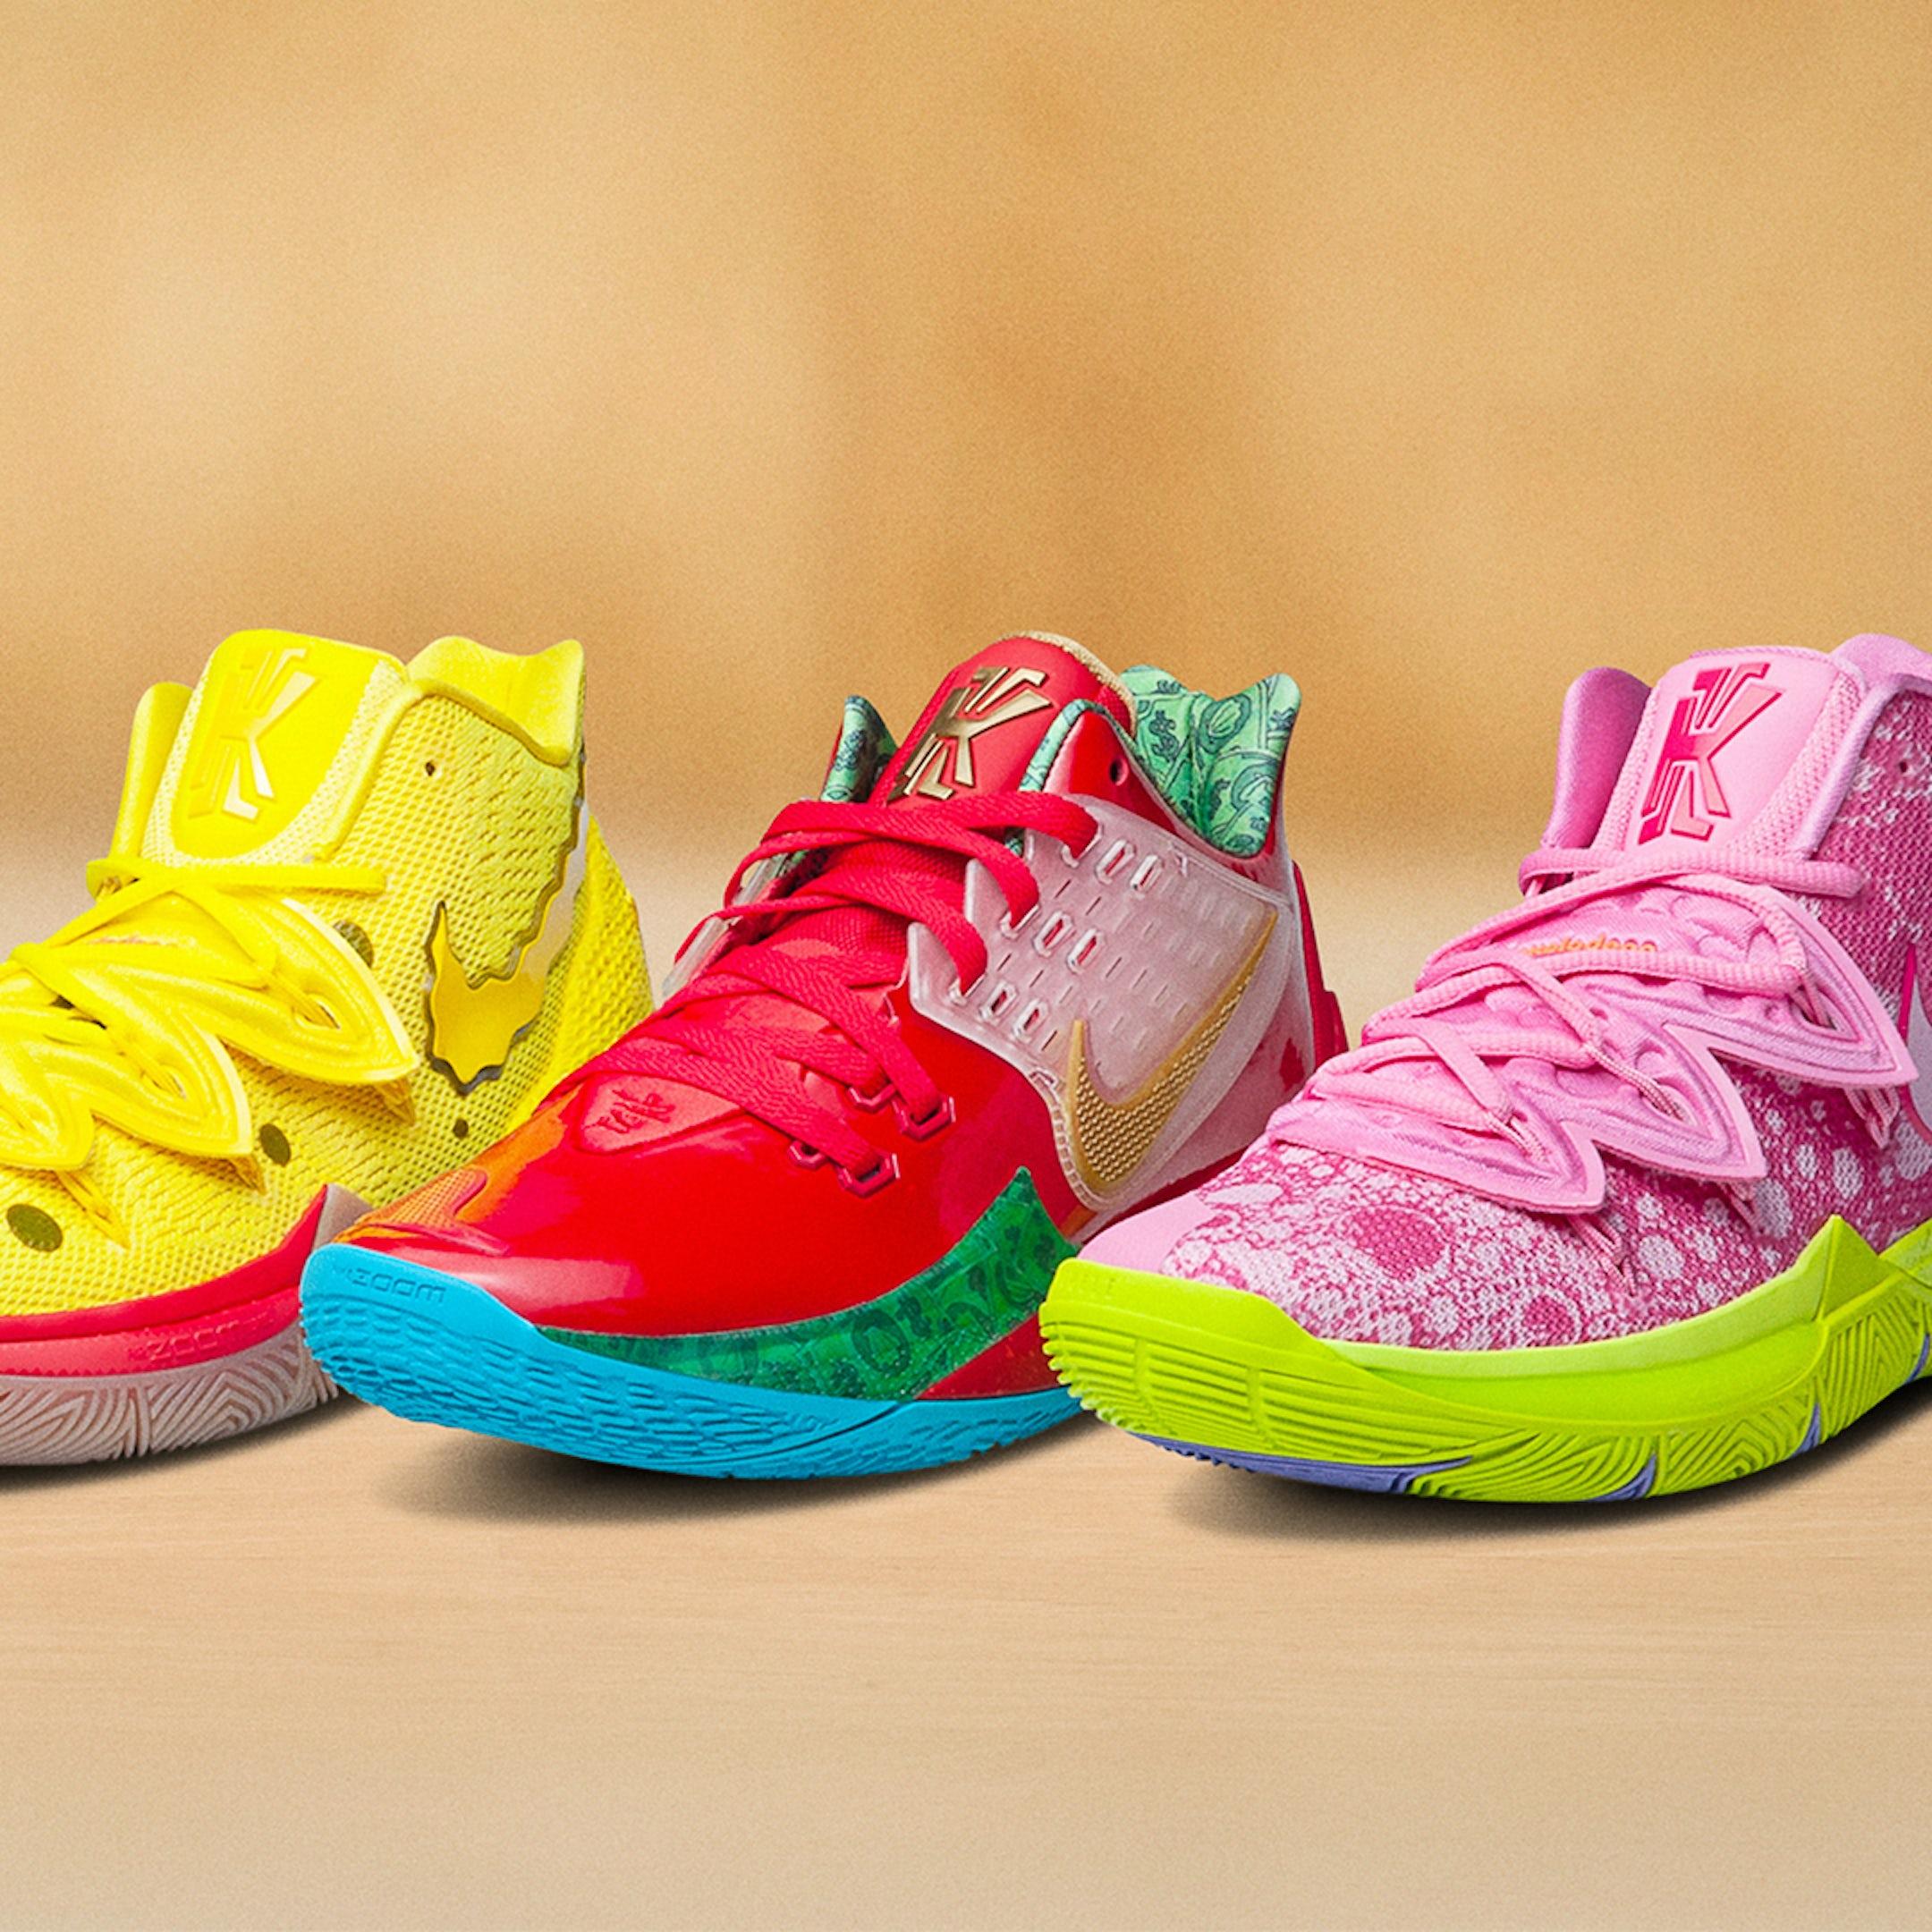 Spongebob Square Pants Nike Kyrie Mobile